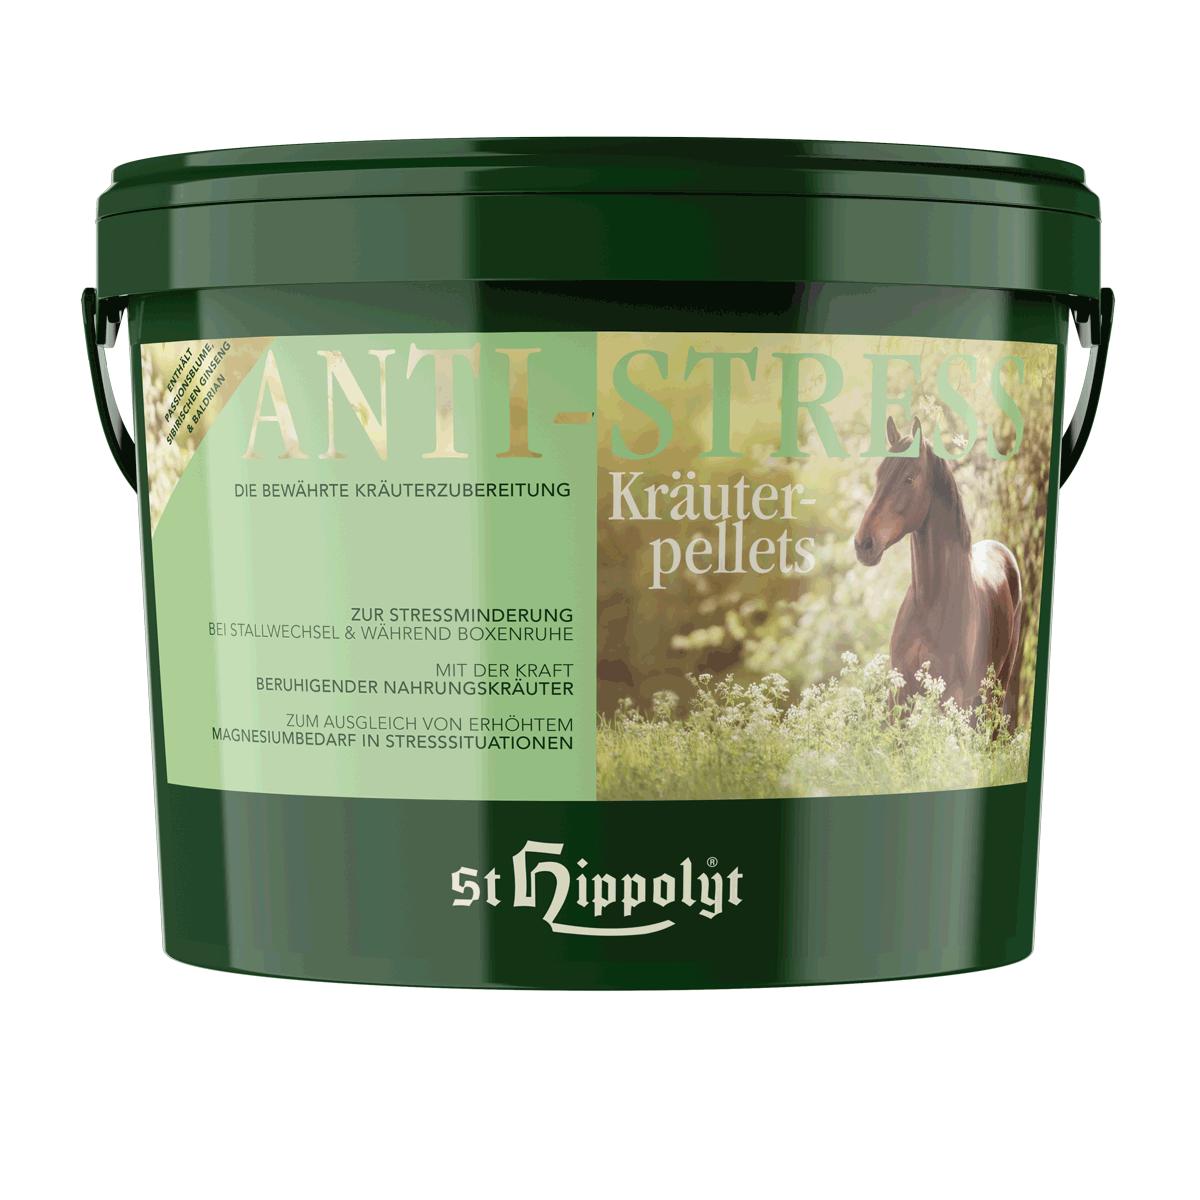 St. Hippolyt Anti-Stress-Kräuterpellets 3kg